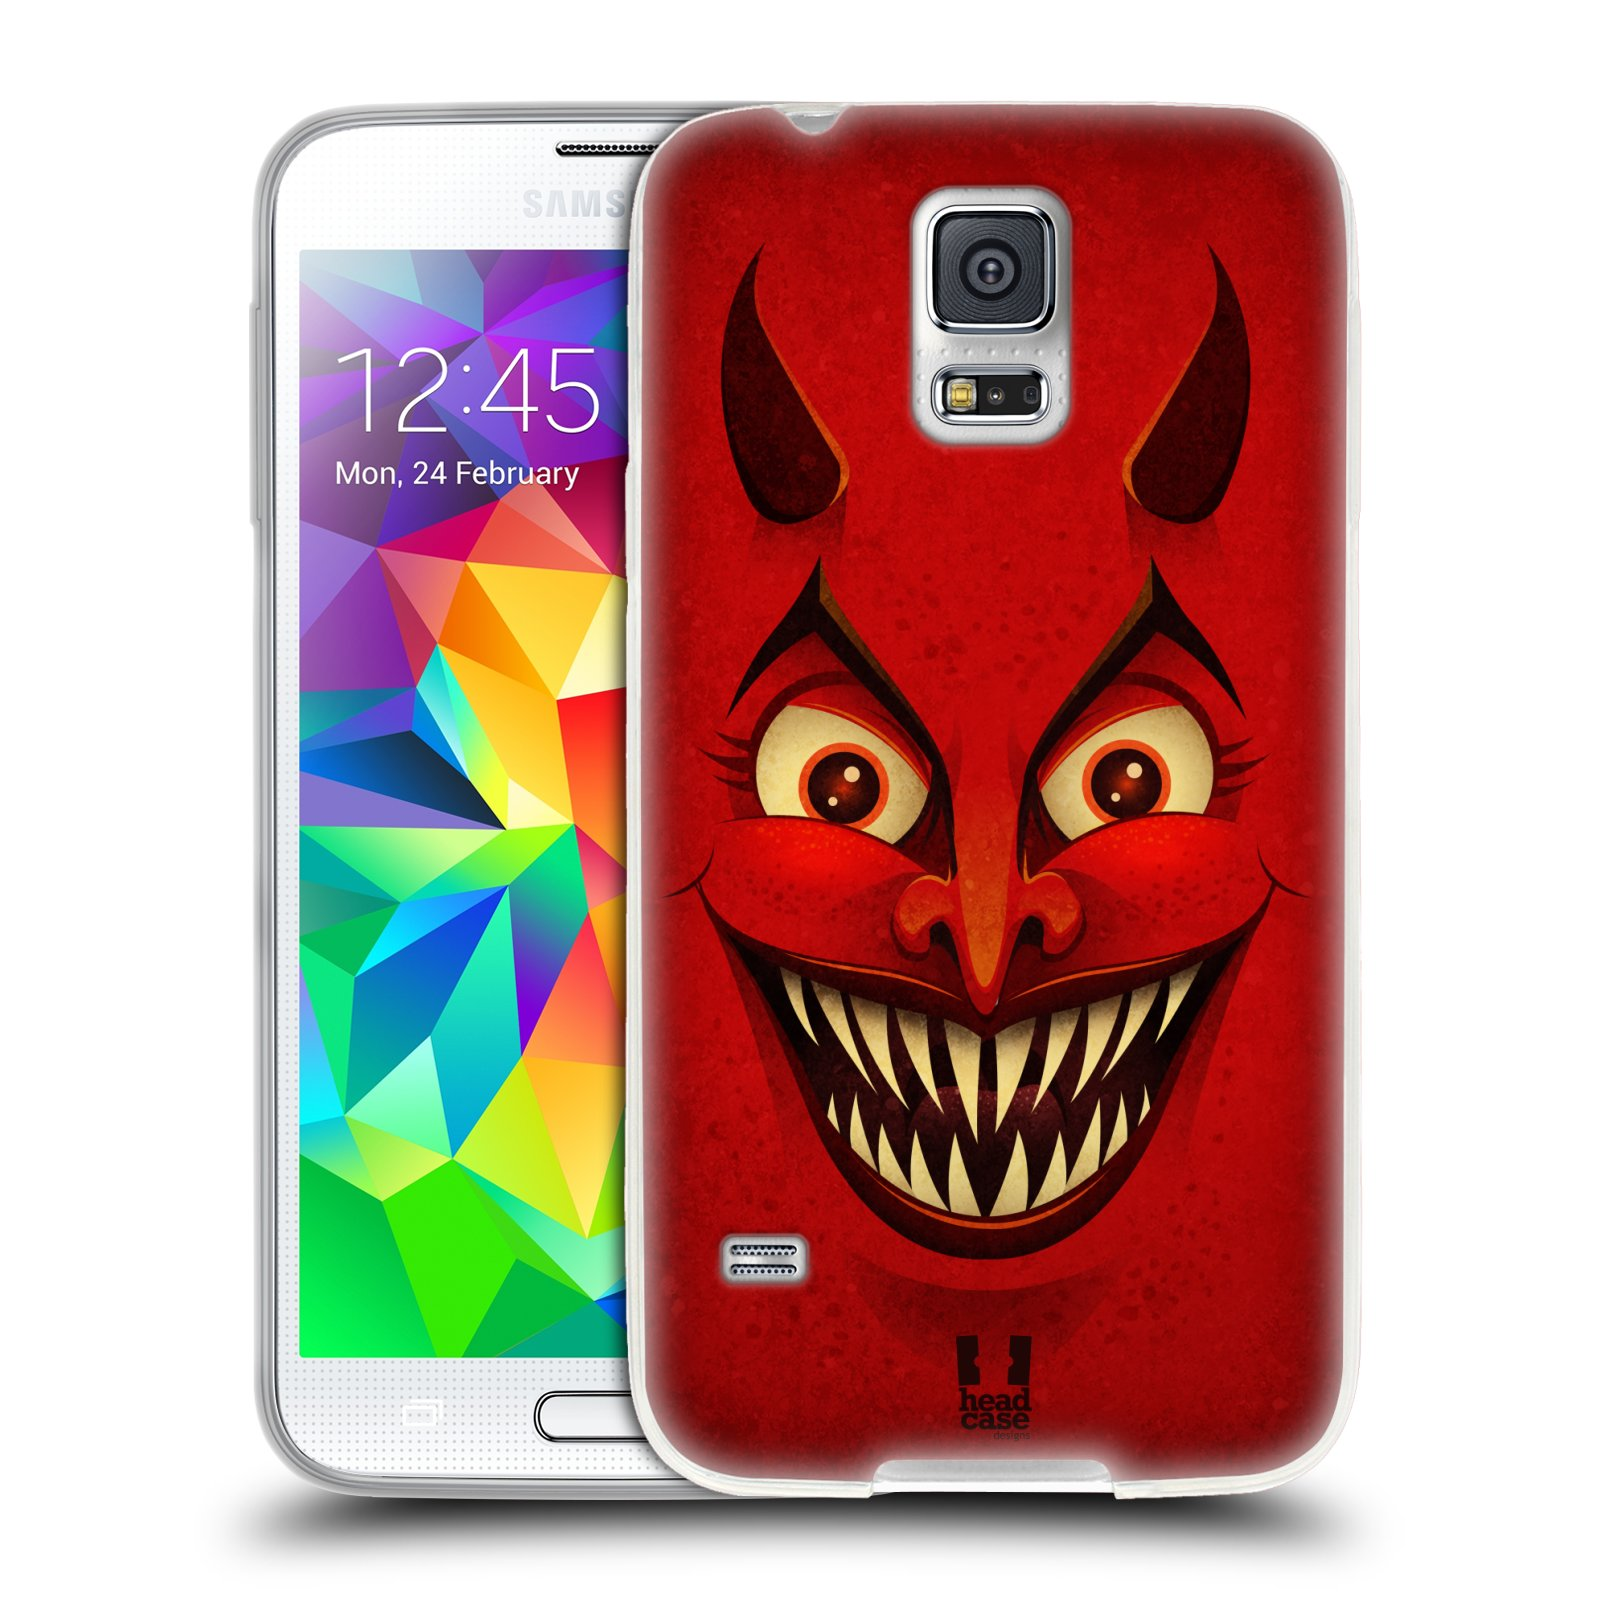 Silikonové pouzdro na mobil Samsung Galaxy S5 HEAD CASE ČERT (Silikonový kryt či obal na mobilní telefon Samsung Galaxy S5 SM-G900F)